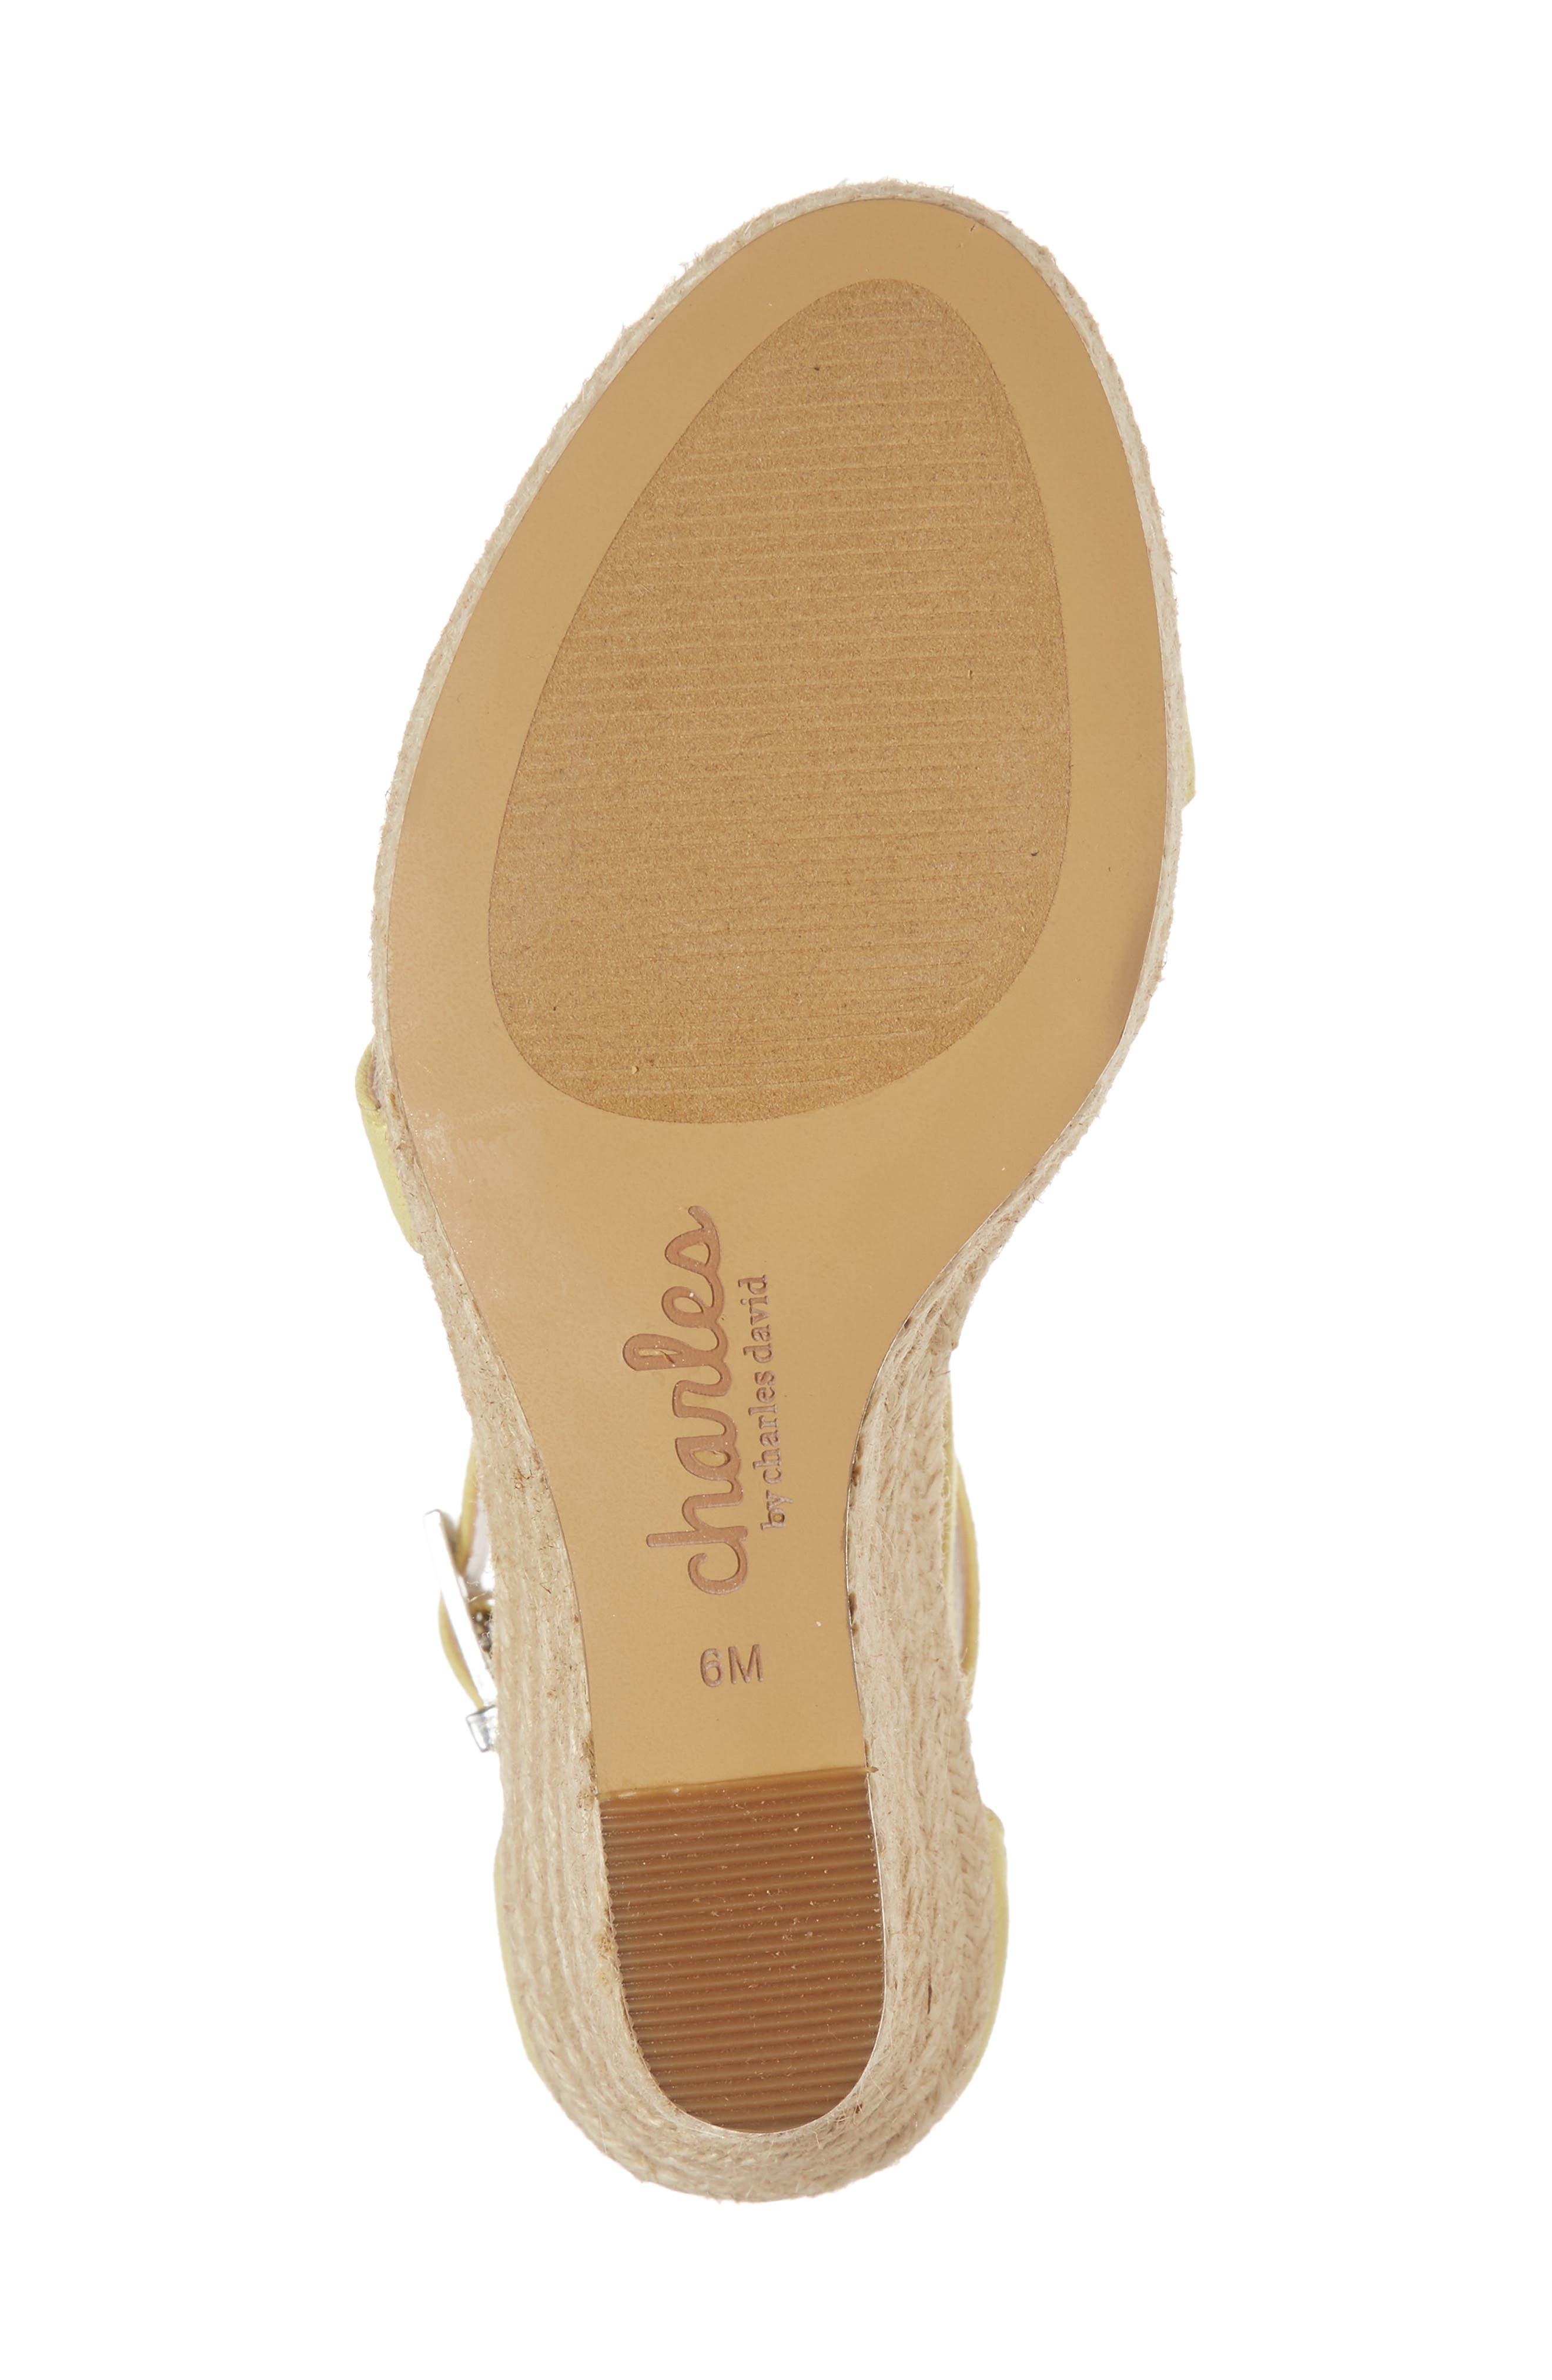 Lou Asymmetrical Wedge Sandal,                             Alternate thumbnail 6, color,                             BUTTERCUP SUEDE